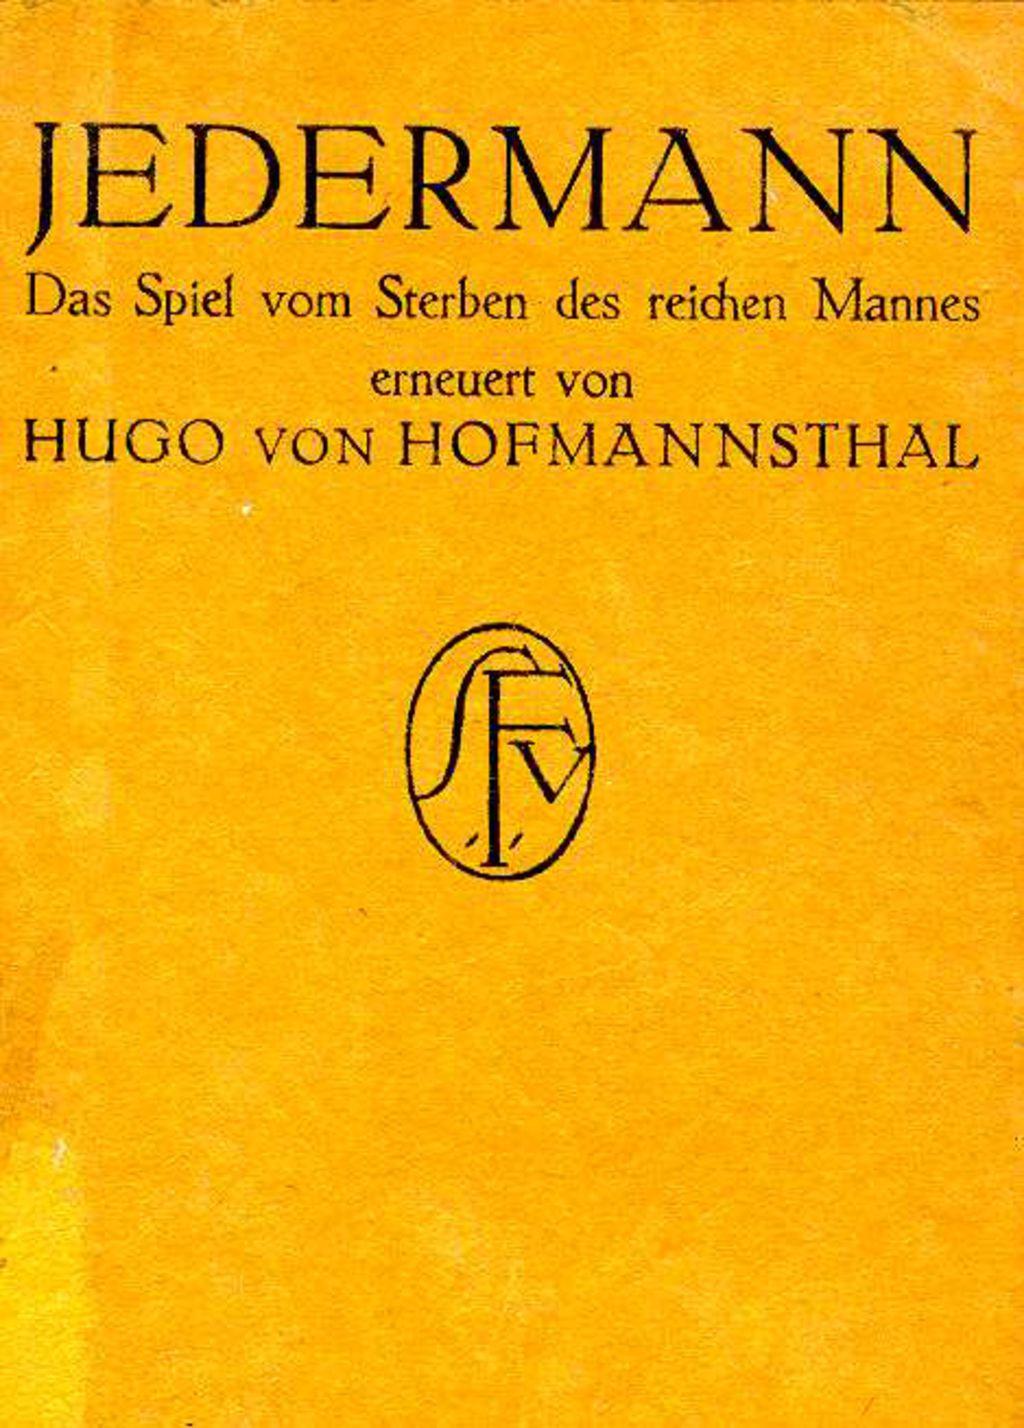 Jedermann Hofmannsthal